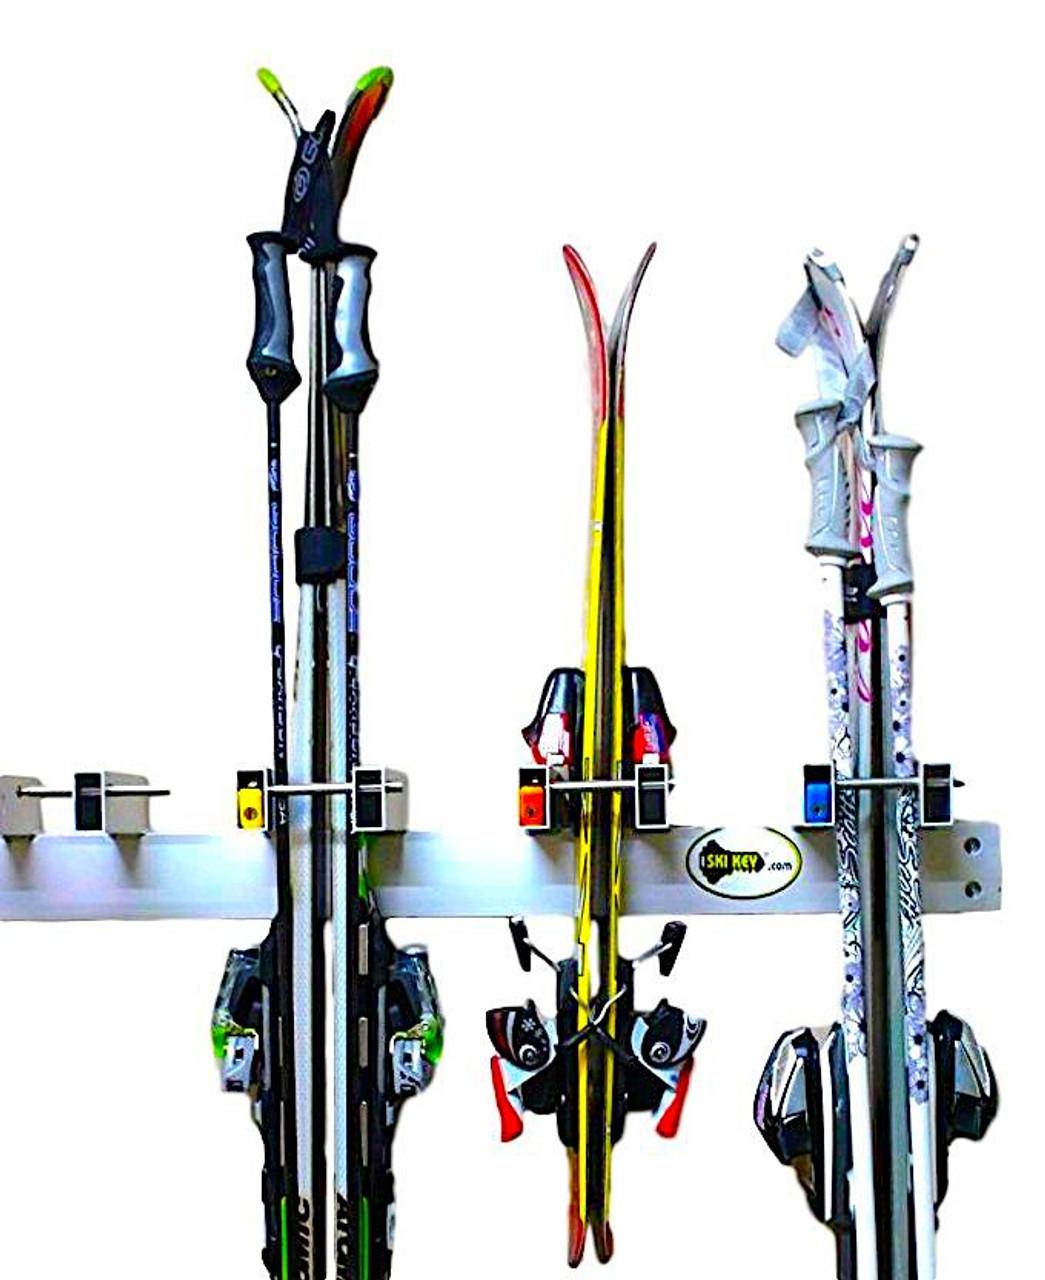 Locking Ski Wall Rack | Ski Resort Rack